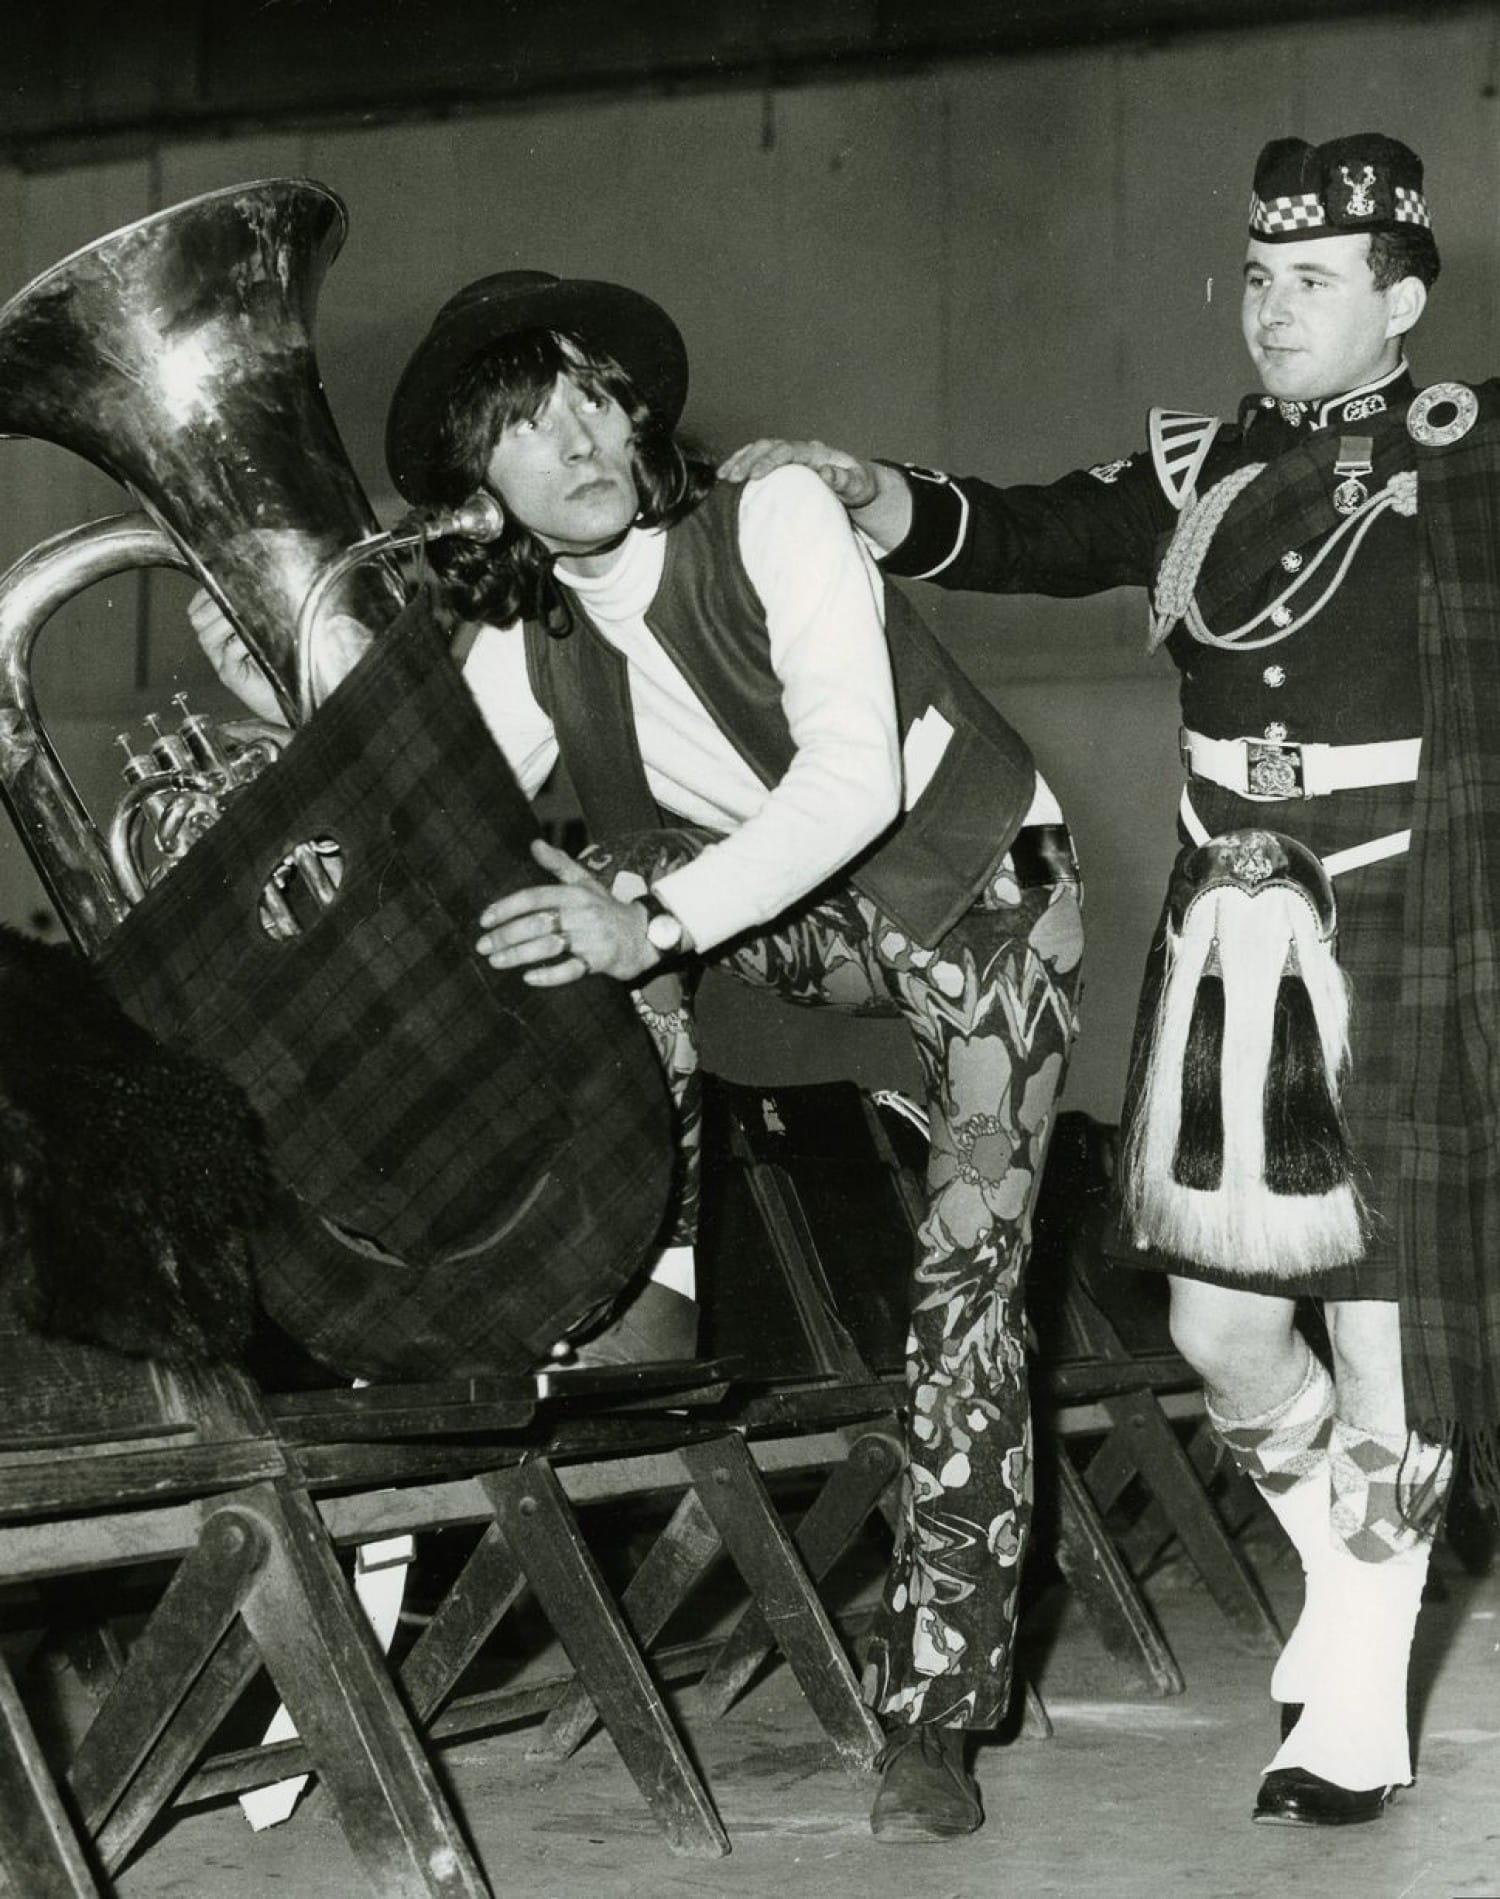 Umpa, umpa, stick it up yer jumper! DJ Stuart Henry gets his collar felt by pipe bandsman Mick Fox